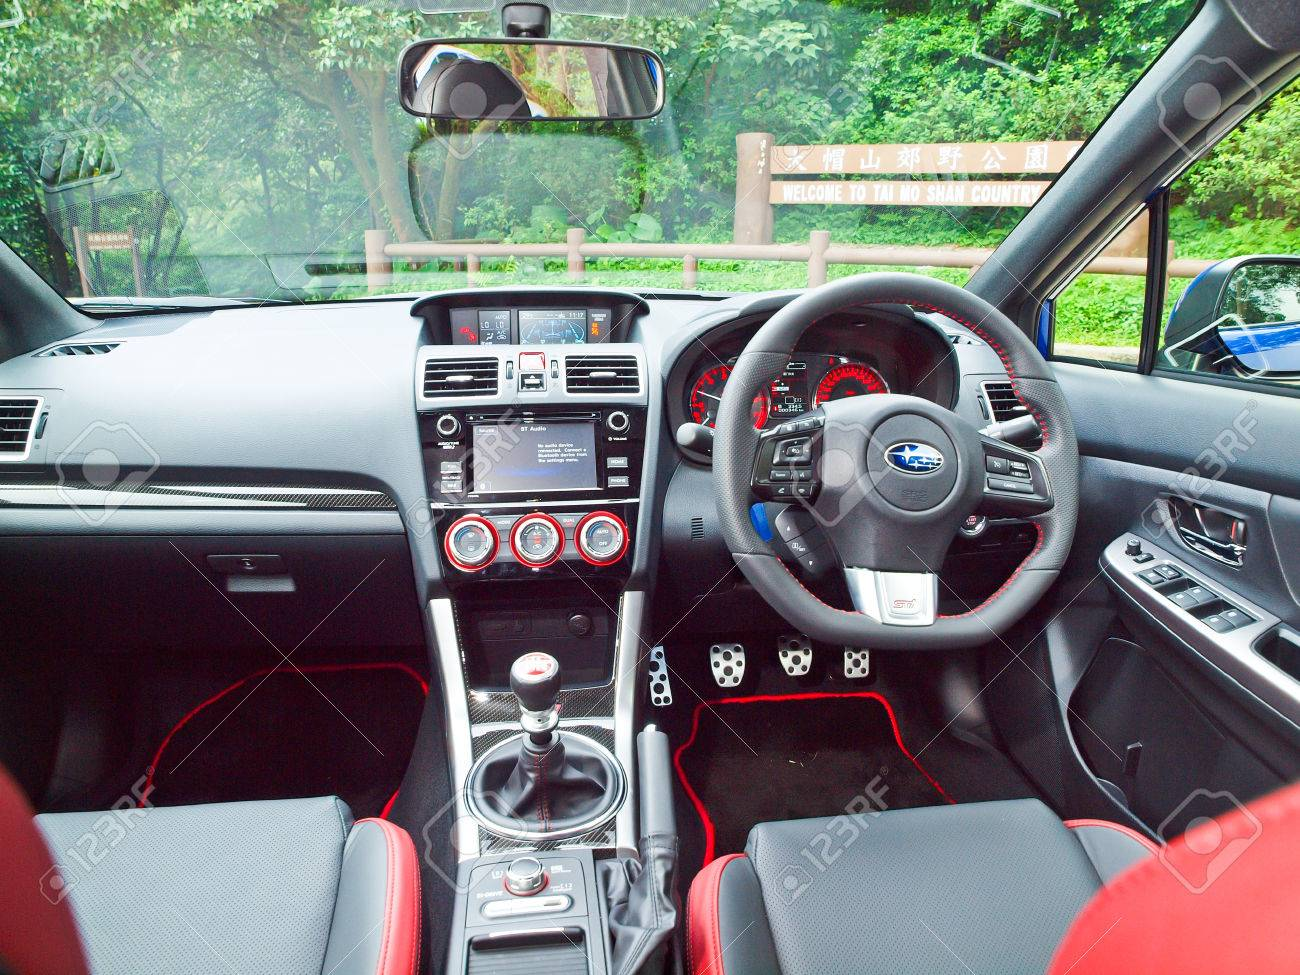 Hong Kong, China Oct 2 2015 : Subaru WRX STI 2015 Interior On Oct 2